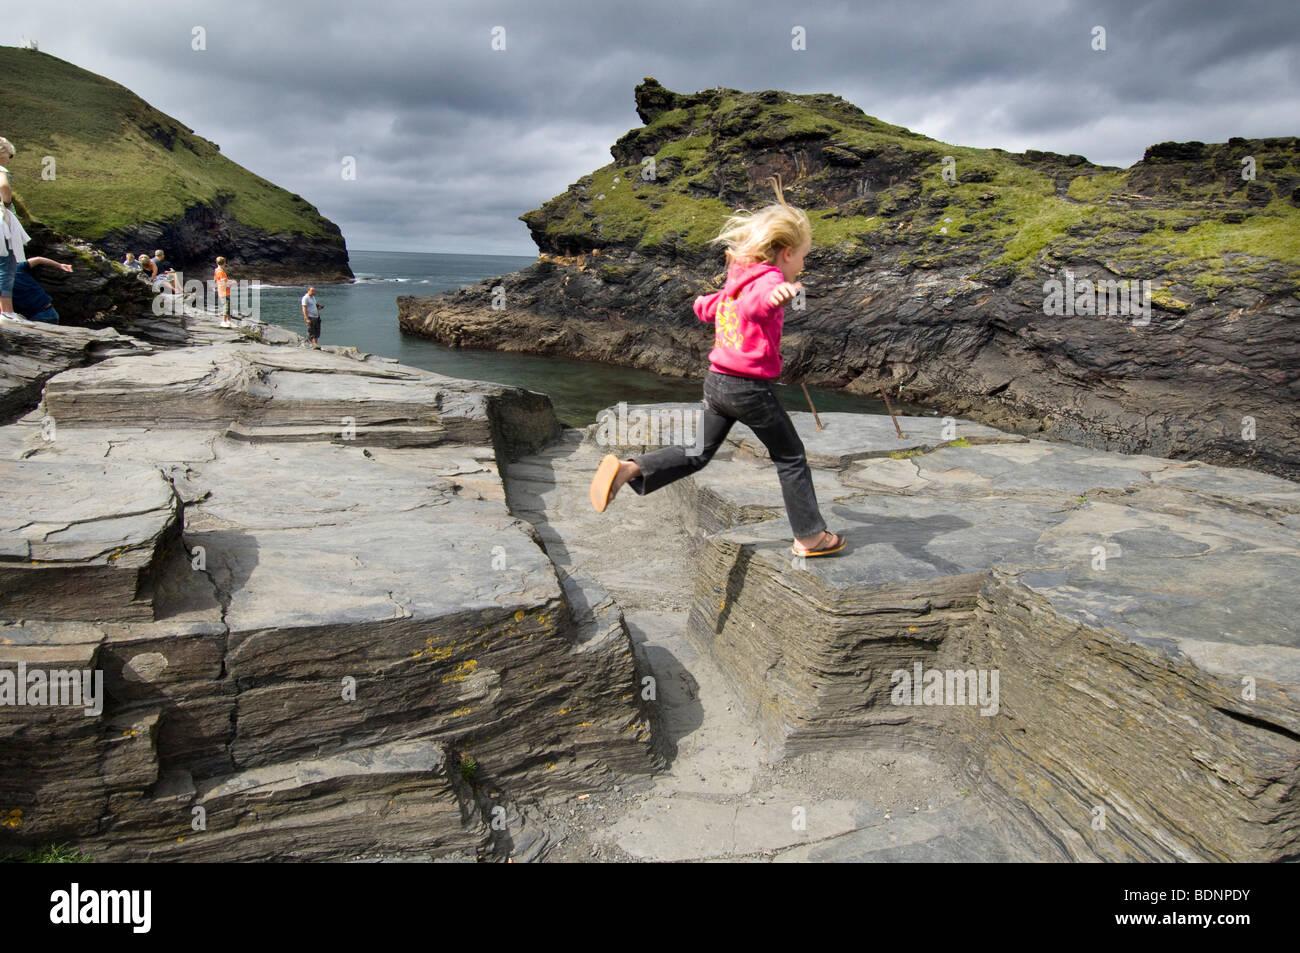 A little girl with fair hair jumps across rocks in  Boscastle harbour near Wadebridge, Cornwall. - Stock Image